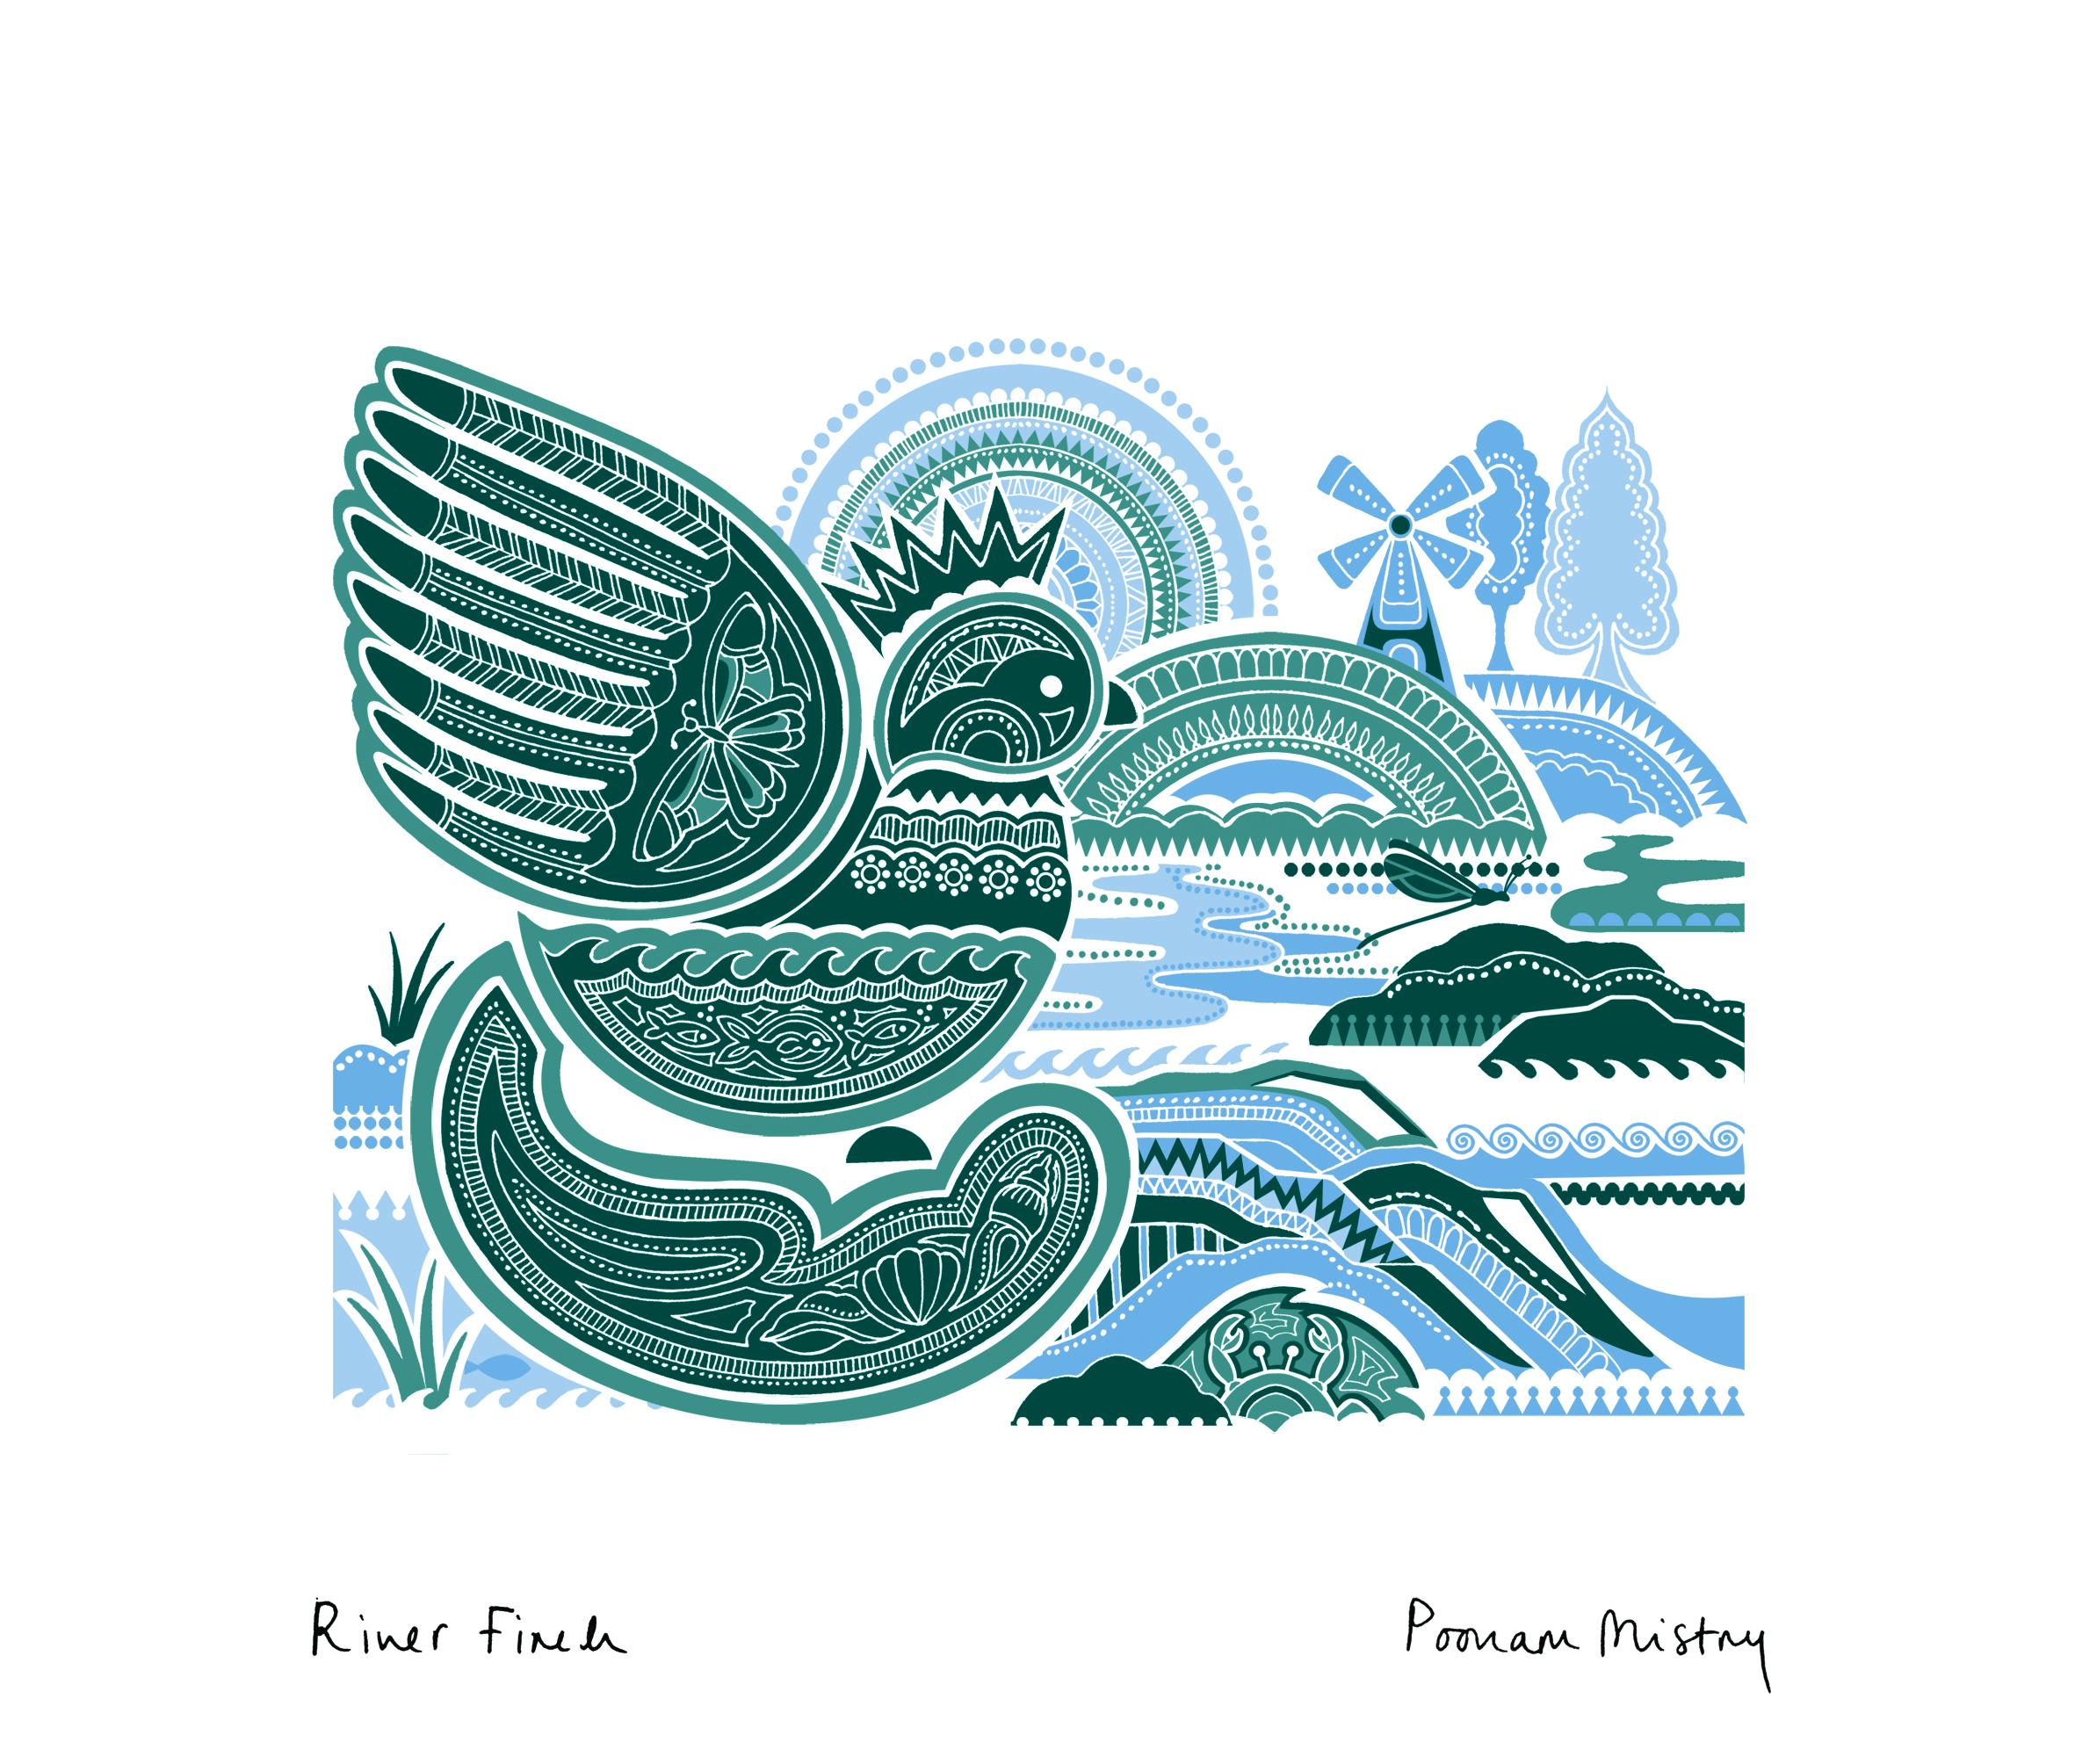 River Finch